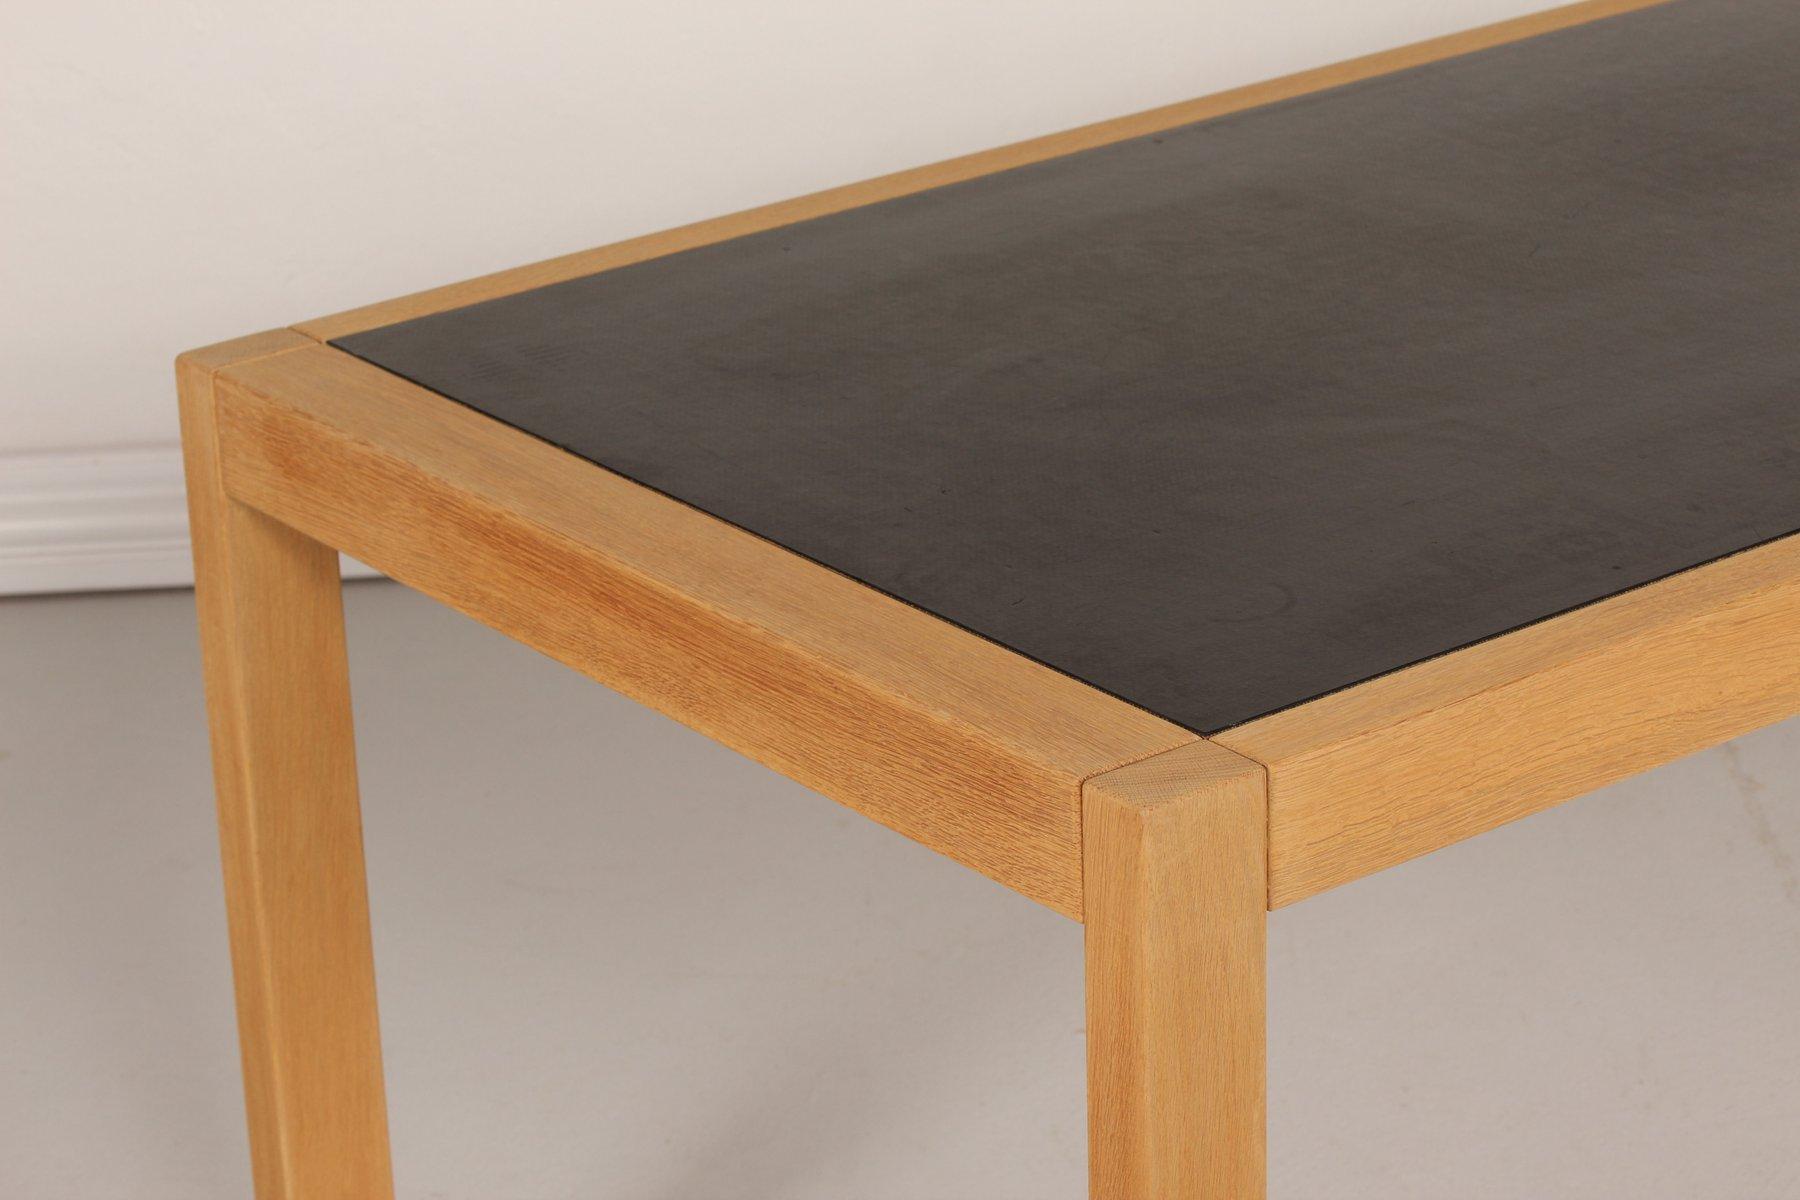 danish oak working table with black linoleum top 1970s for sale at pamono. Black Bedroom Furniture Sets. Home Design Ideas